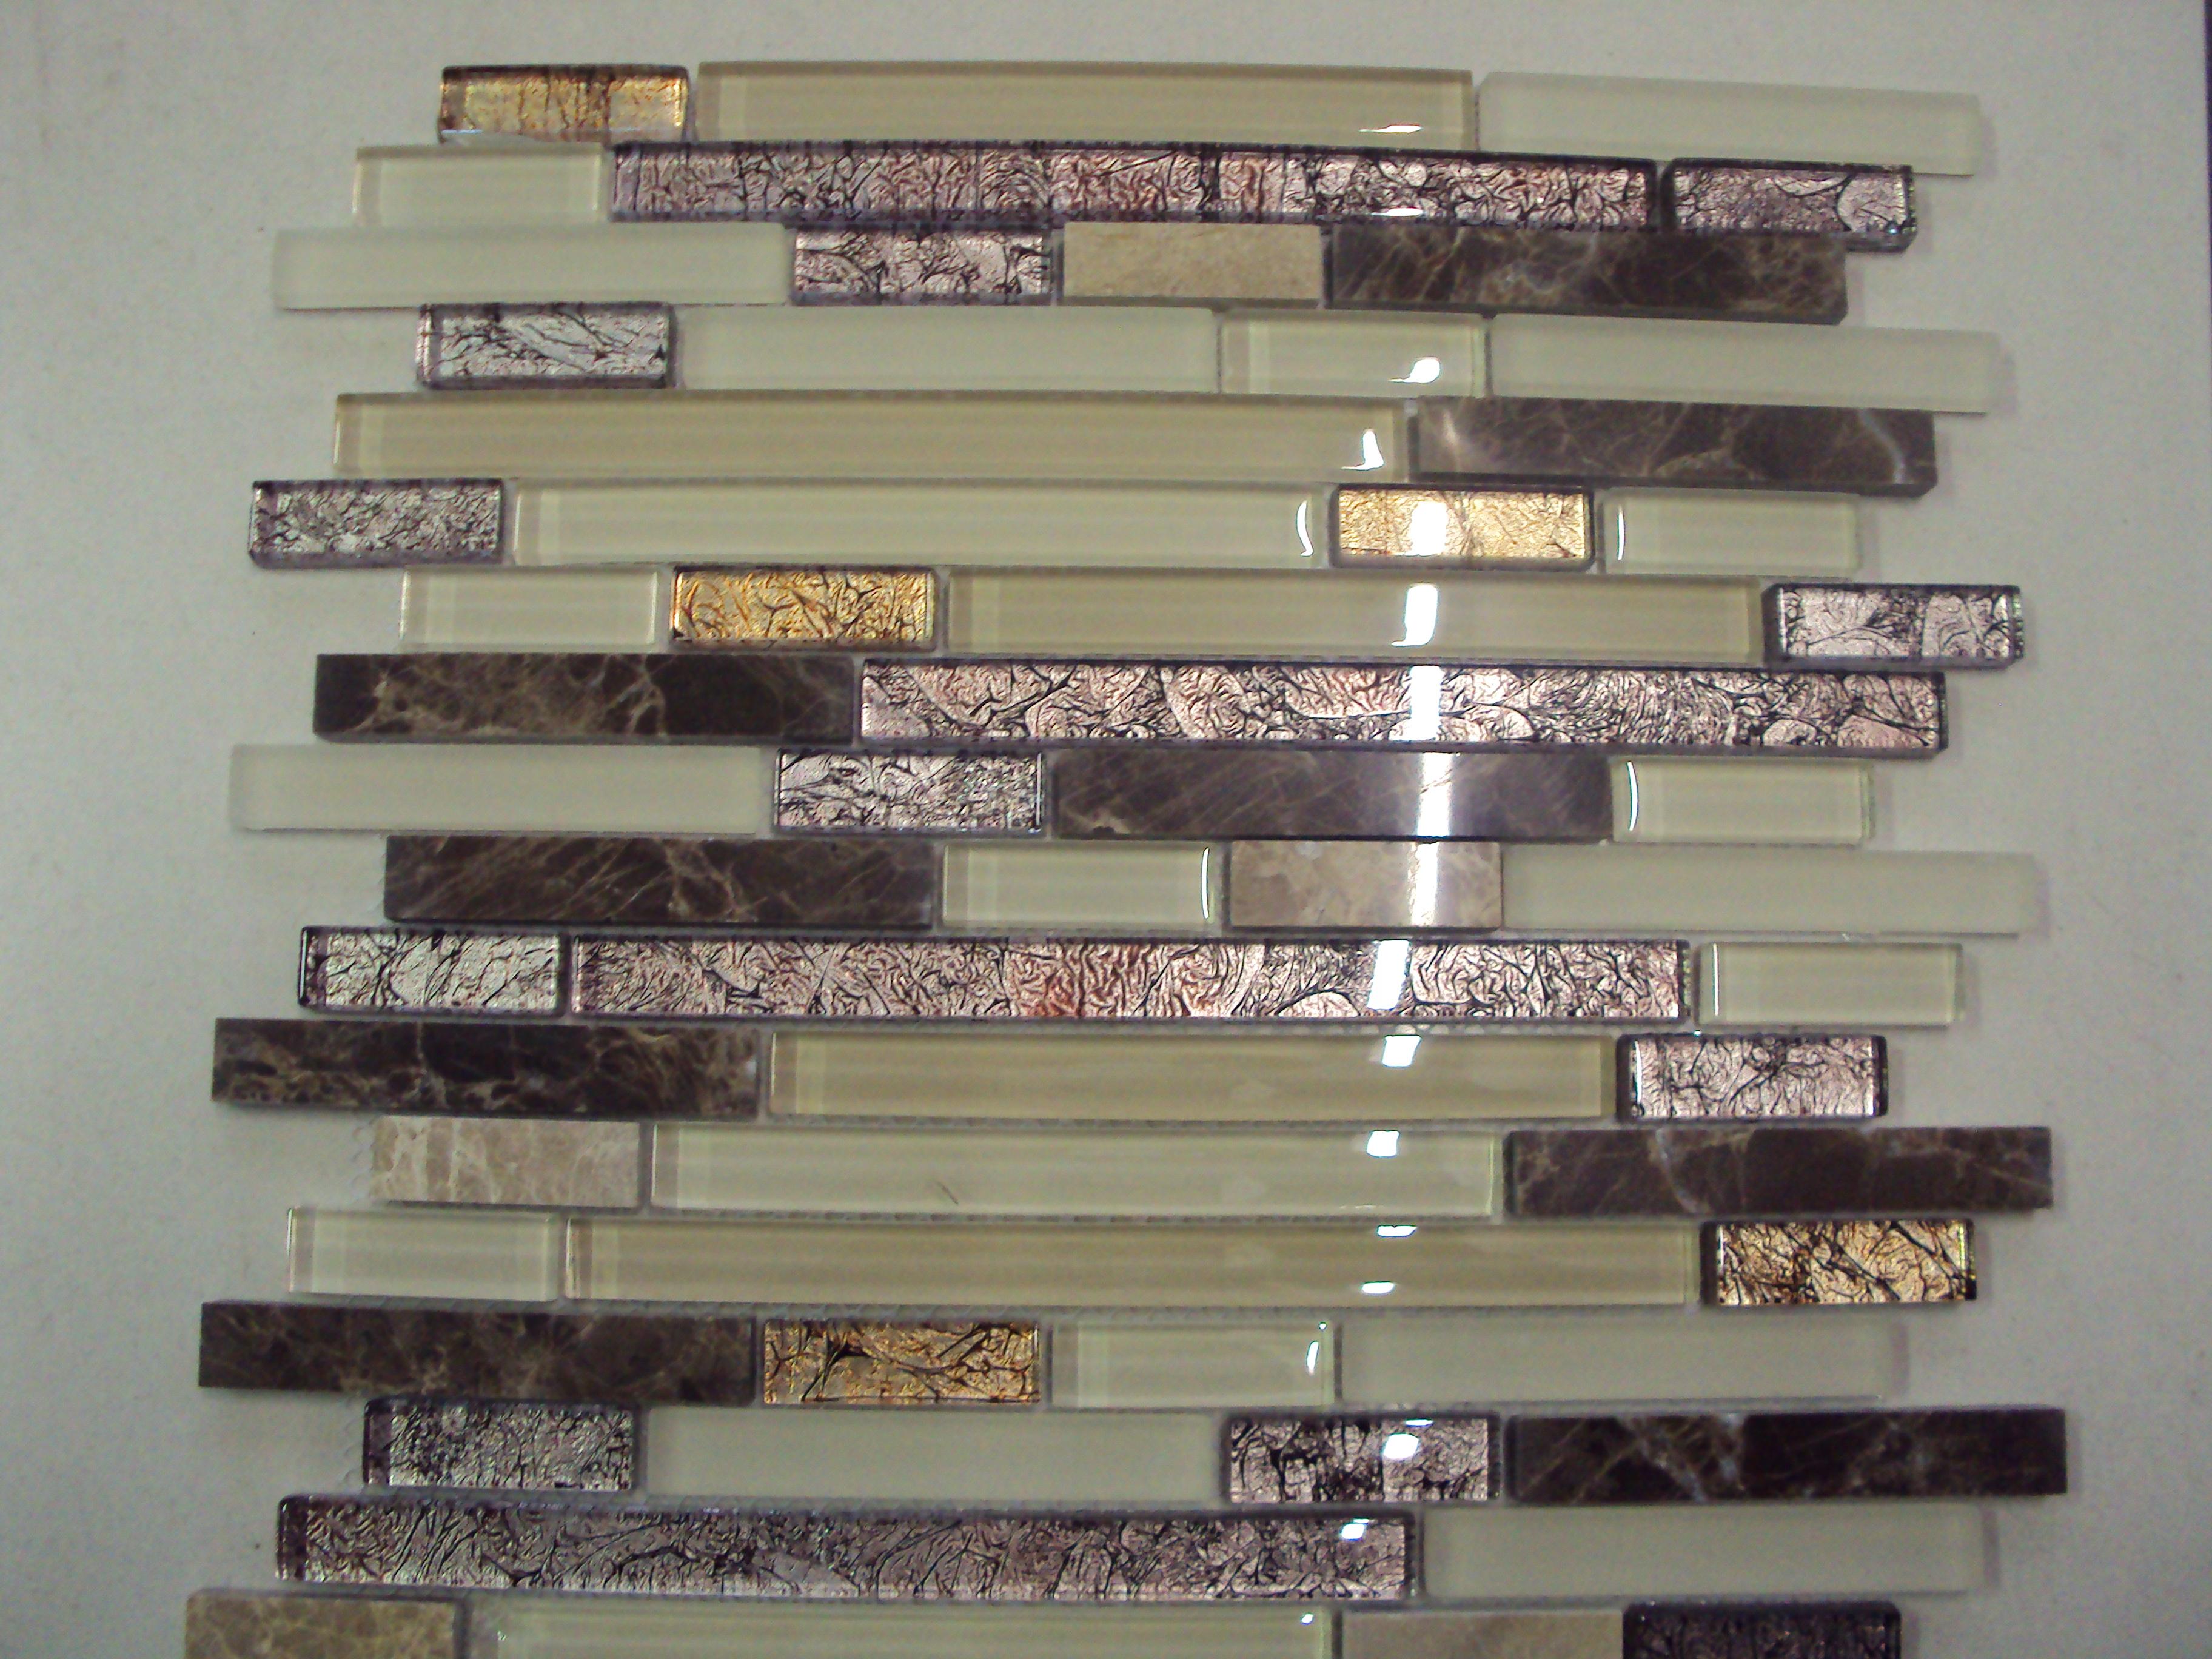 Malla vidrio persia strip 30x30 moro revestimientos for Guardas para cocina